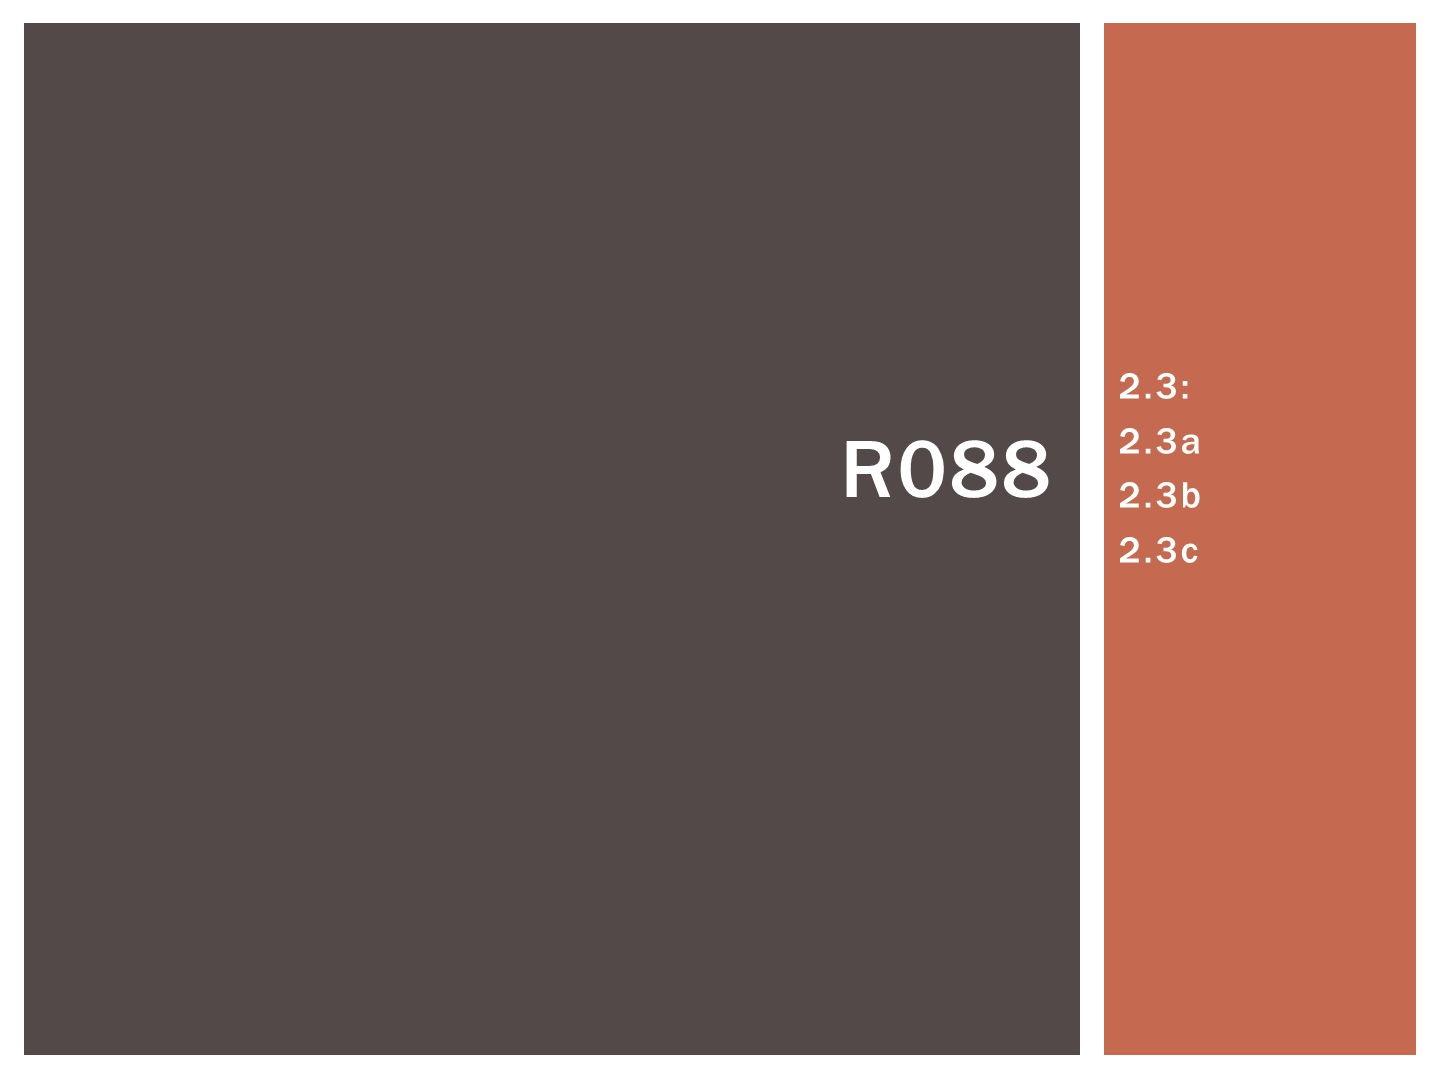 R088 - Creating a Digital Sound Sequence, [LO2.3], CAMNATS, Creative iMedia Lvls 1/2